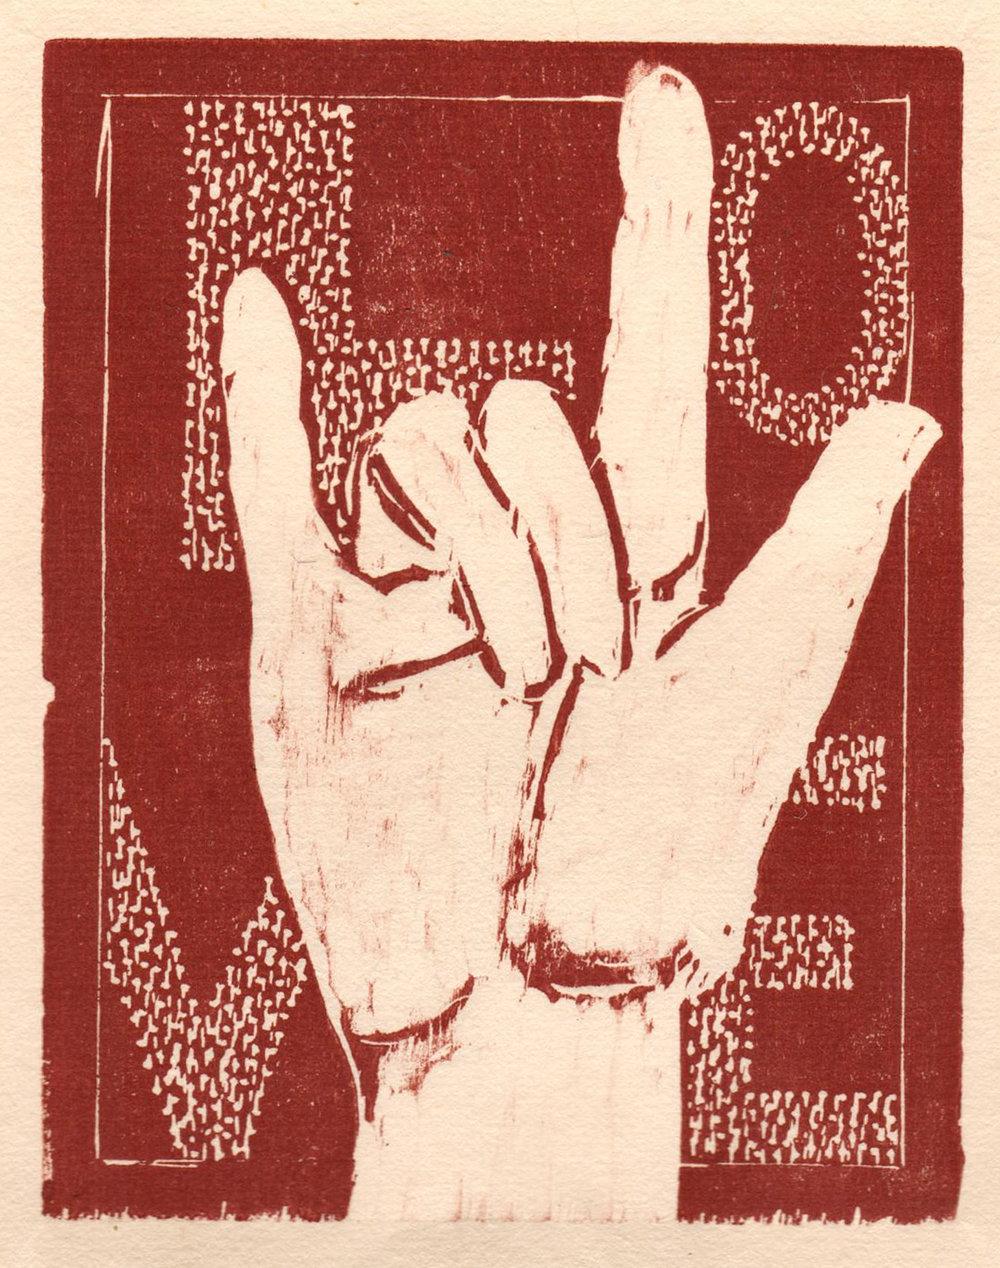 "<p><strong>STEPHANIE STIGLIANO</strong>printmaking<a href=""/stephanie-stigliano"">More →</a></p>"